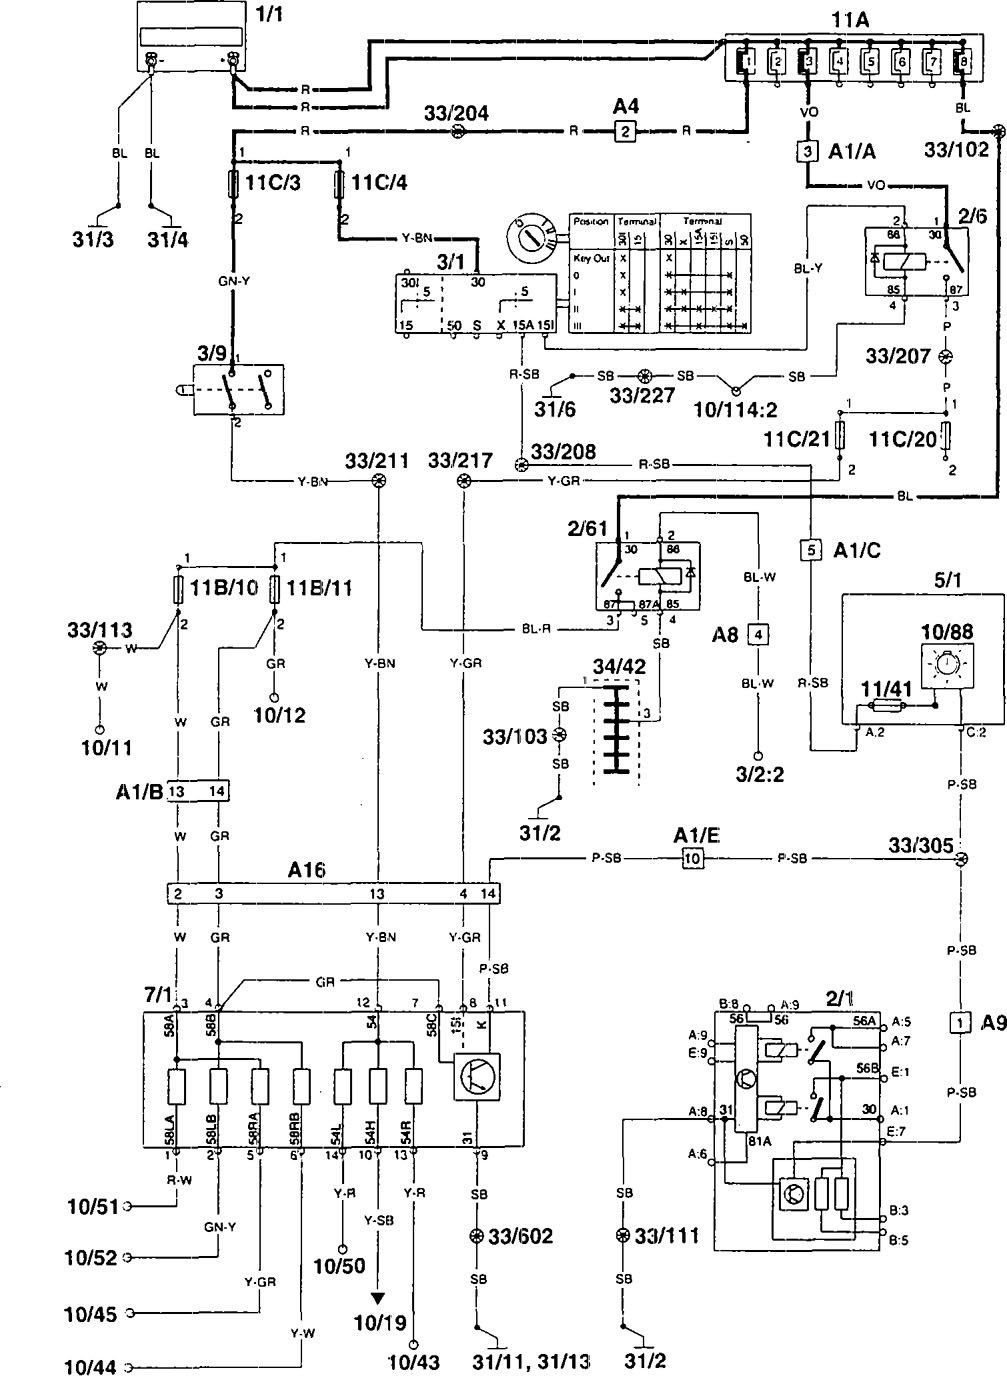 hight resolution of volvo 960 wiring diagram wiring library 1997 volvo 960 wiring diagrams 1995 volvo 960 wiring diagram